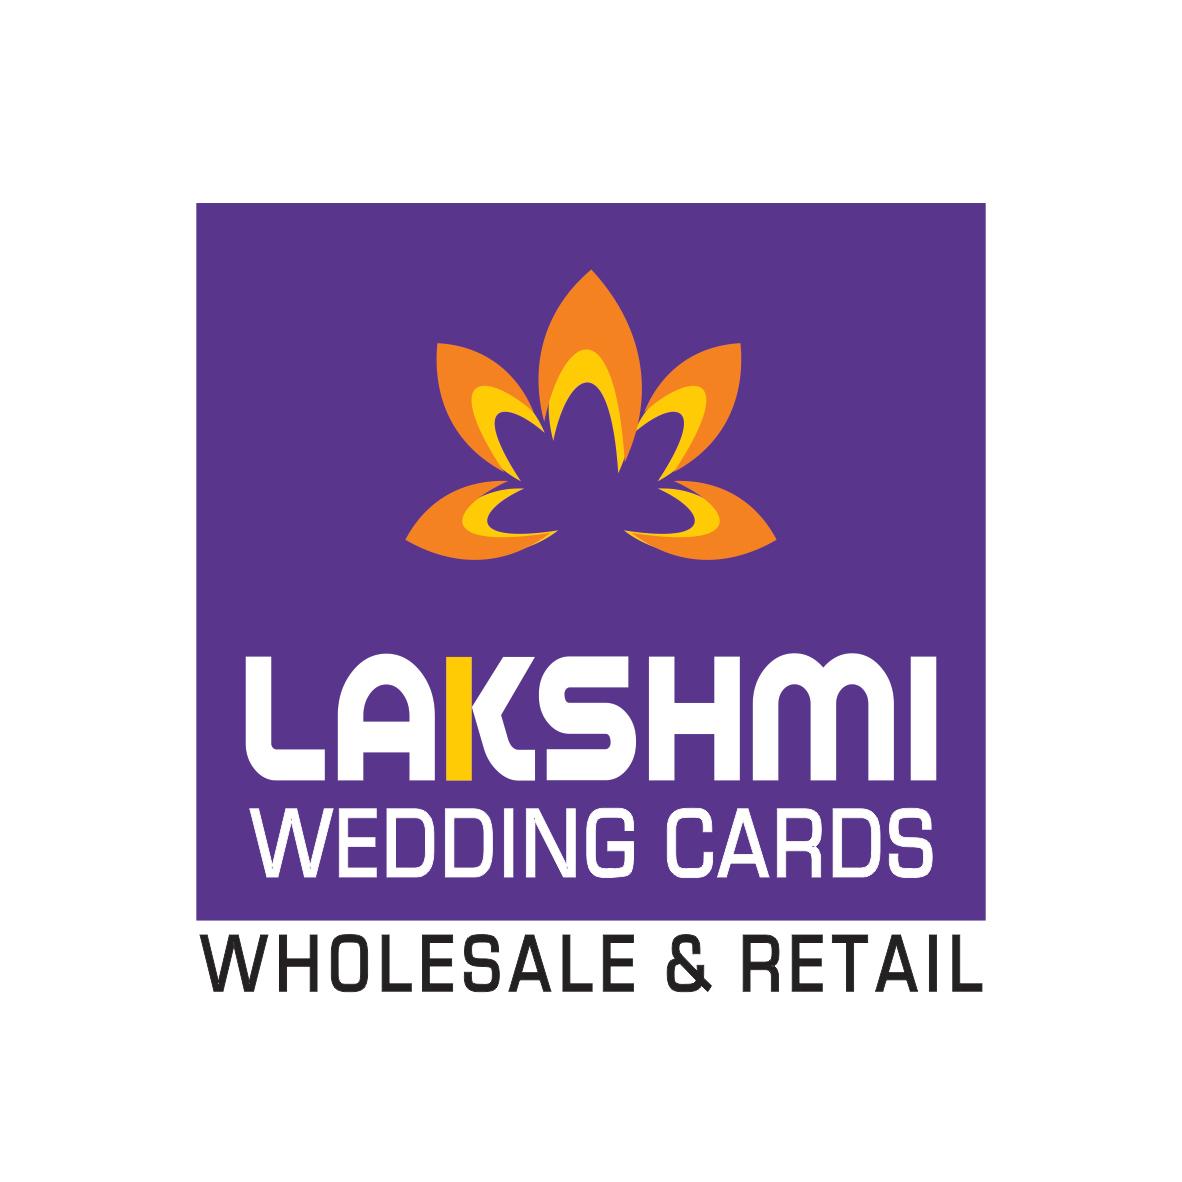 Lakshmi Wedding Cards